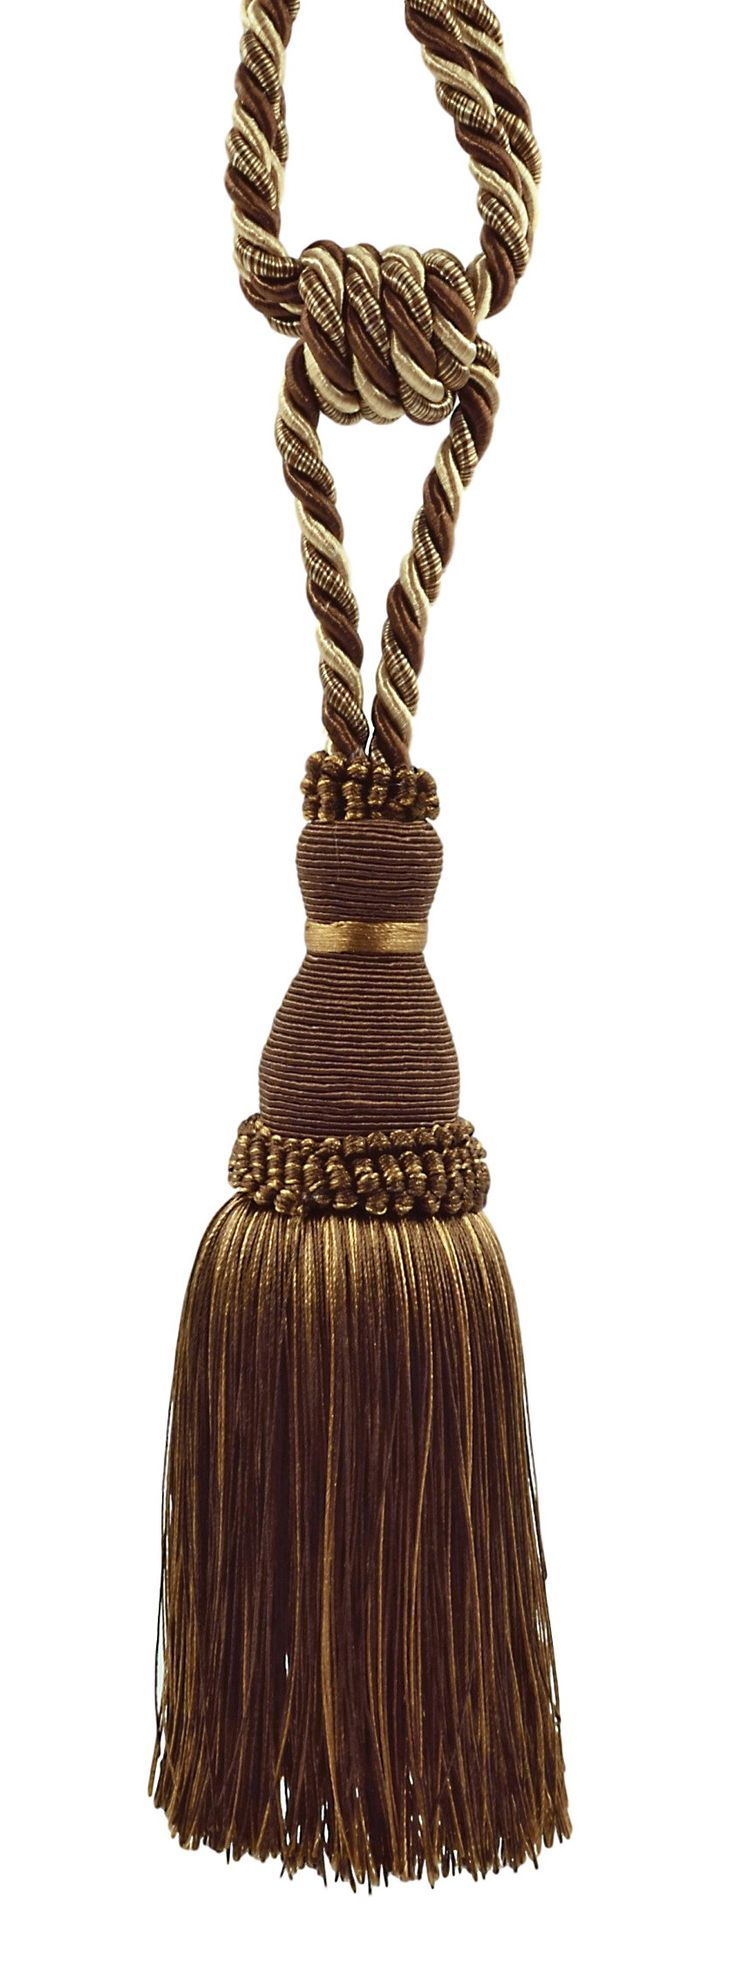 Elegant Dark brown, Sand Curtain & Drapery Tassel Tieback / 8 Inch tassel, 30 Inch Spread (embrace) Style# TBH8 - Espresso Latte D2A2